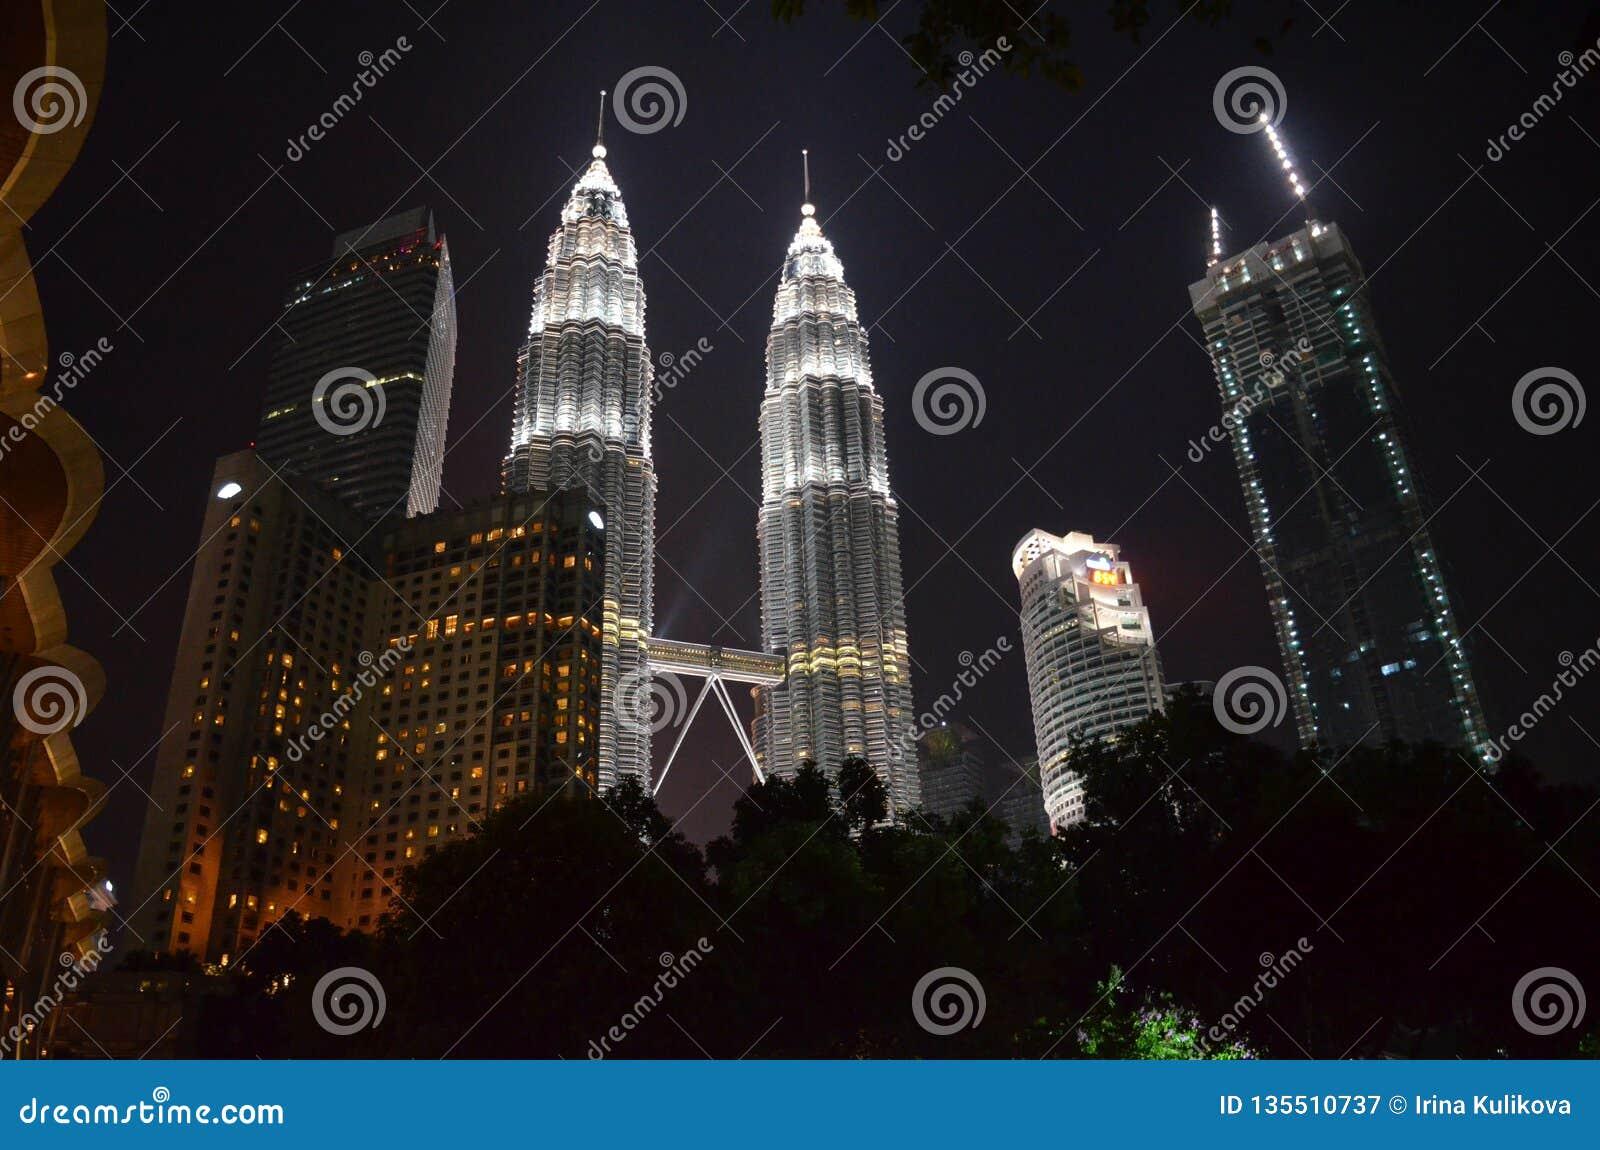 Kuala Lumpur, Maleisië - April 22, 2017: Nachtmening van de verlichte Tweelingtorens van Petronas in Kuala Lumpur, Maleisië